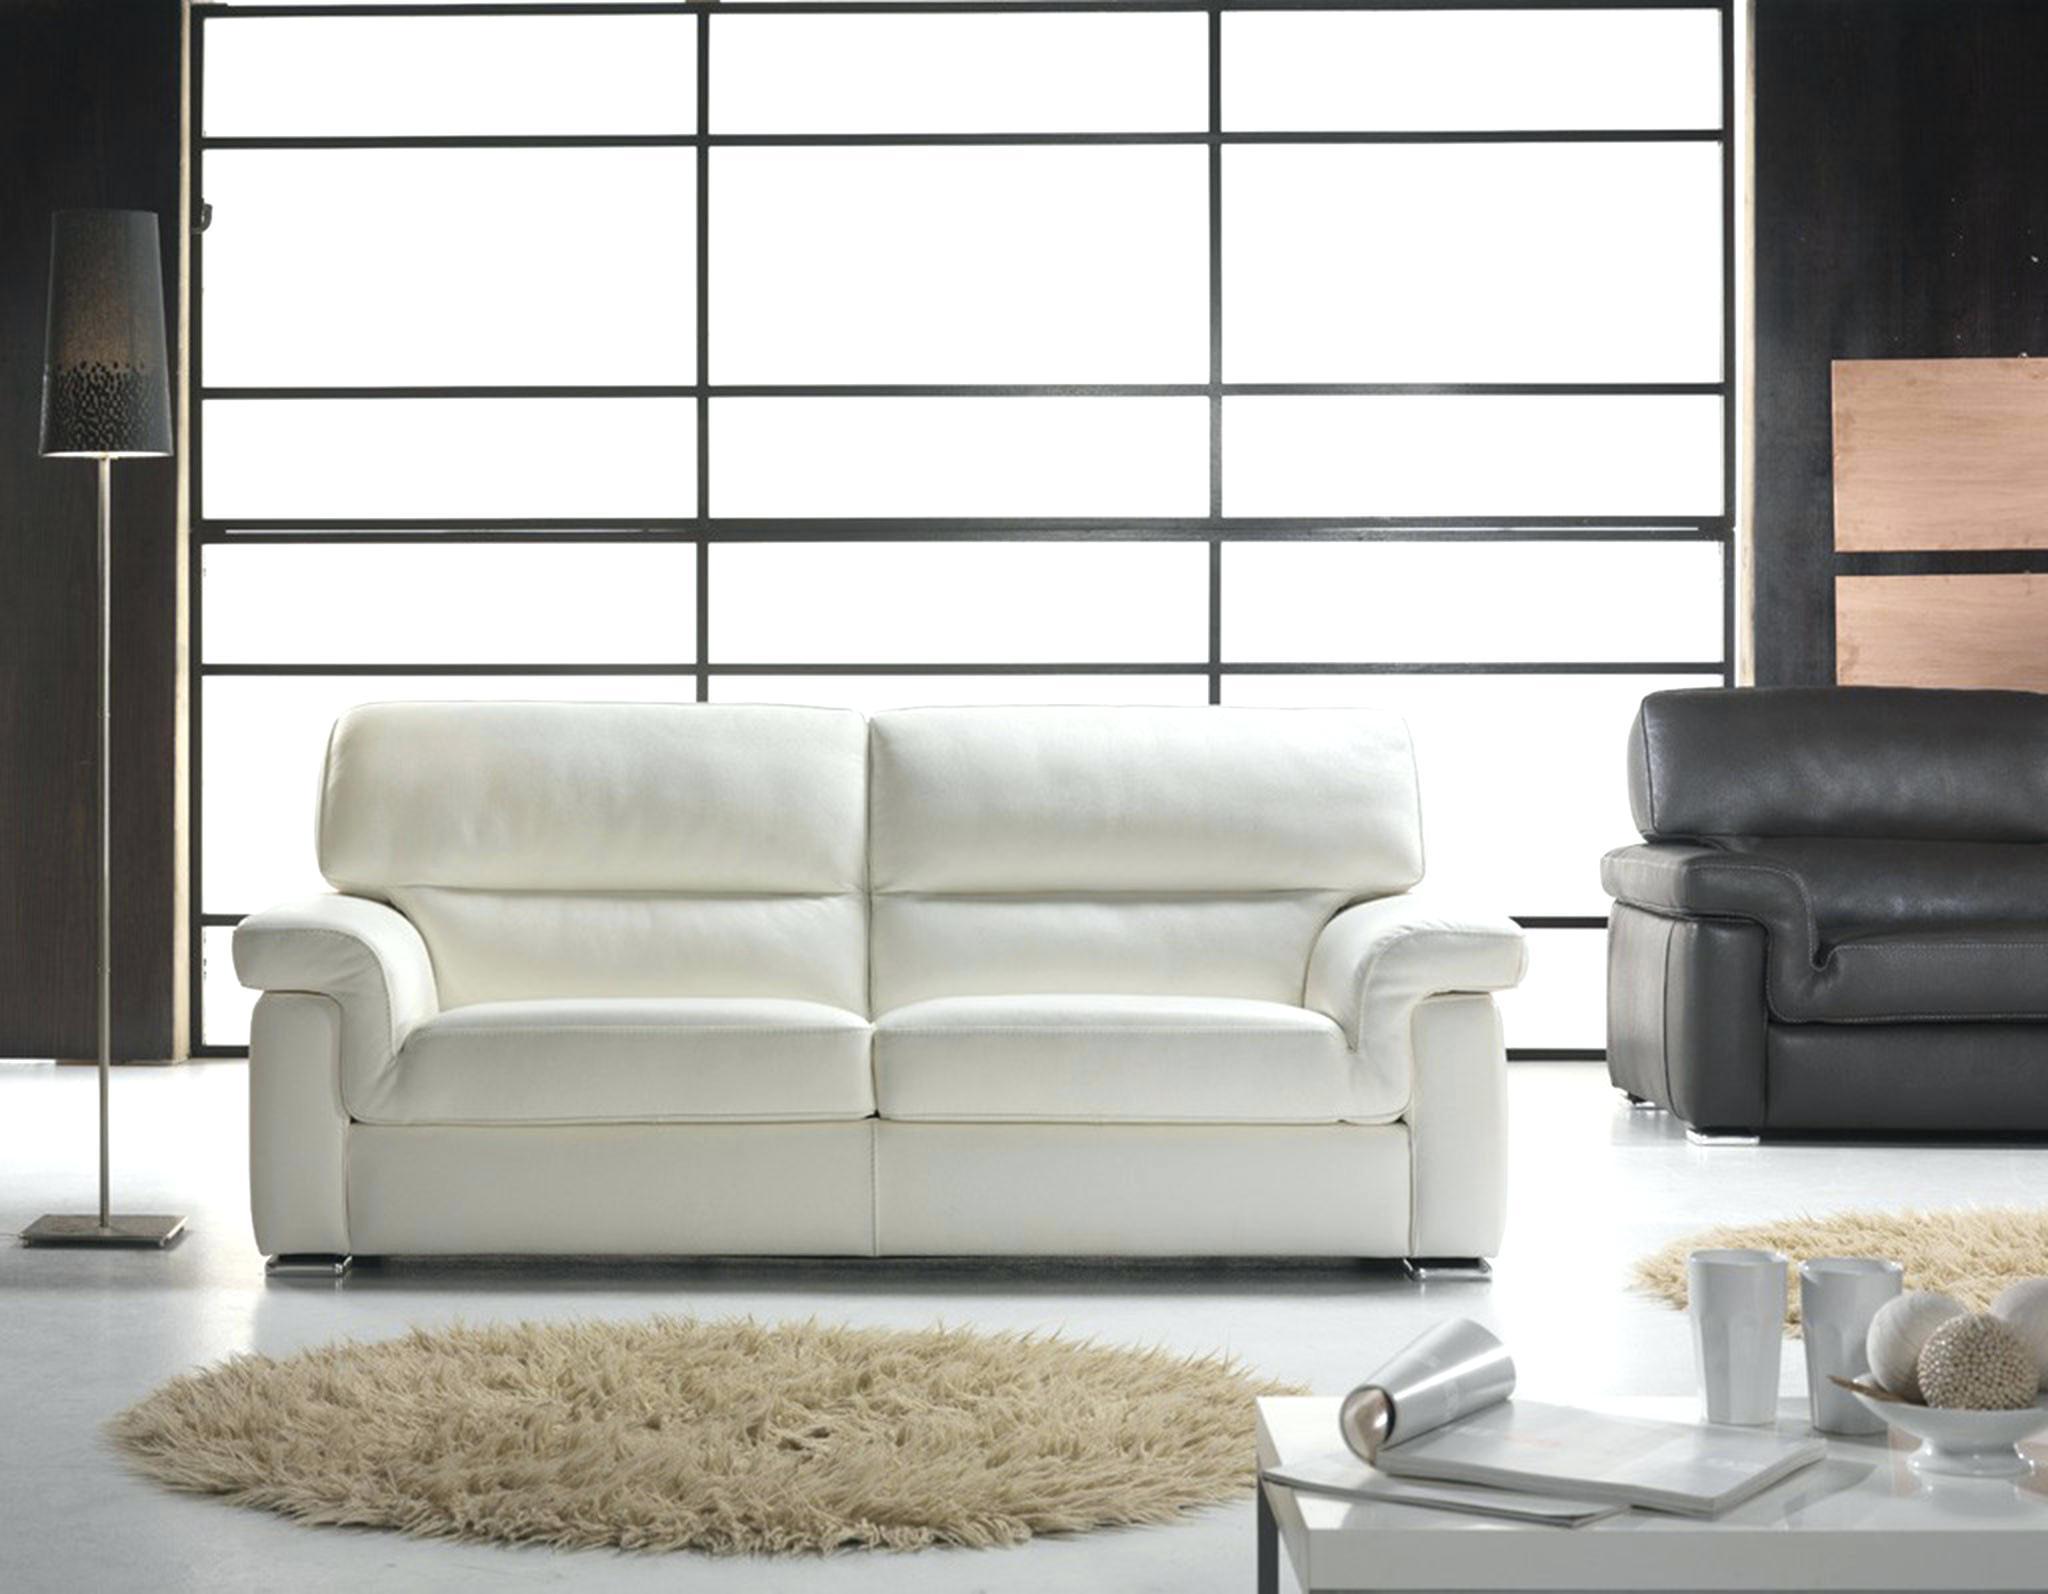 Canape Cuir Blanc Ikea Beau Photos Canap Italien Pas Cher 35 Avec Jobbuddy Co Page 57 Canape D Angle